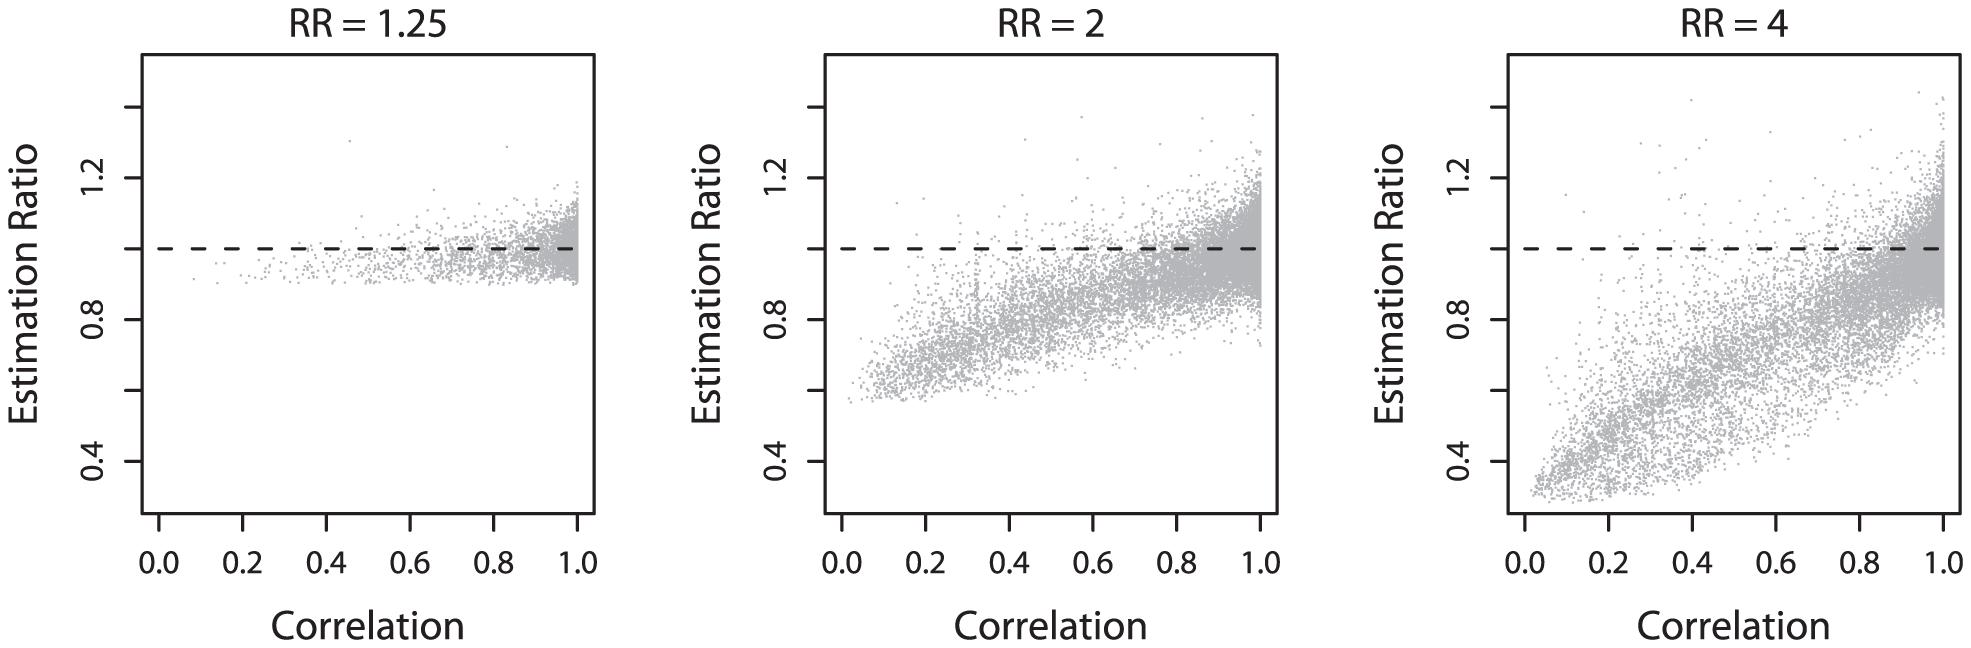 Relationship between underestimation and correlation.